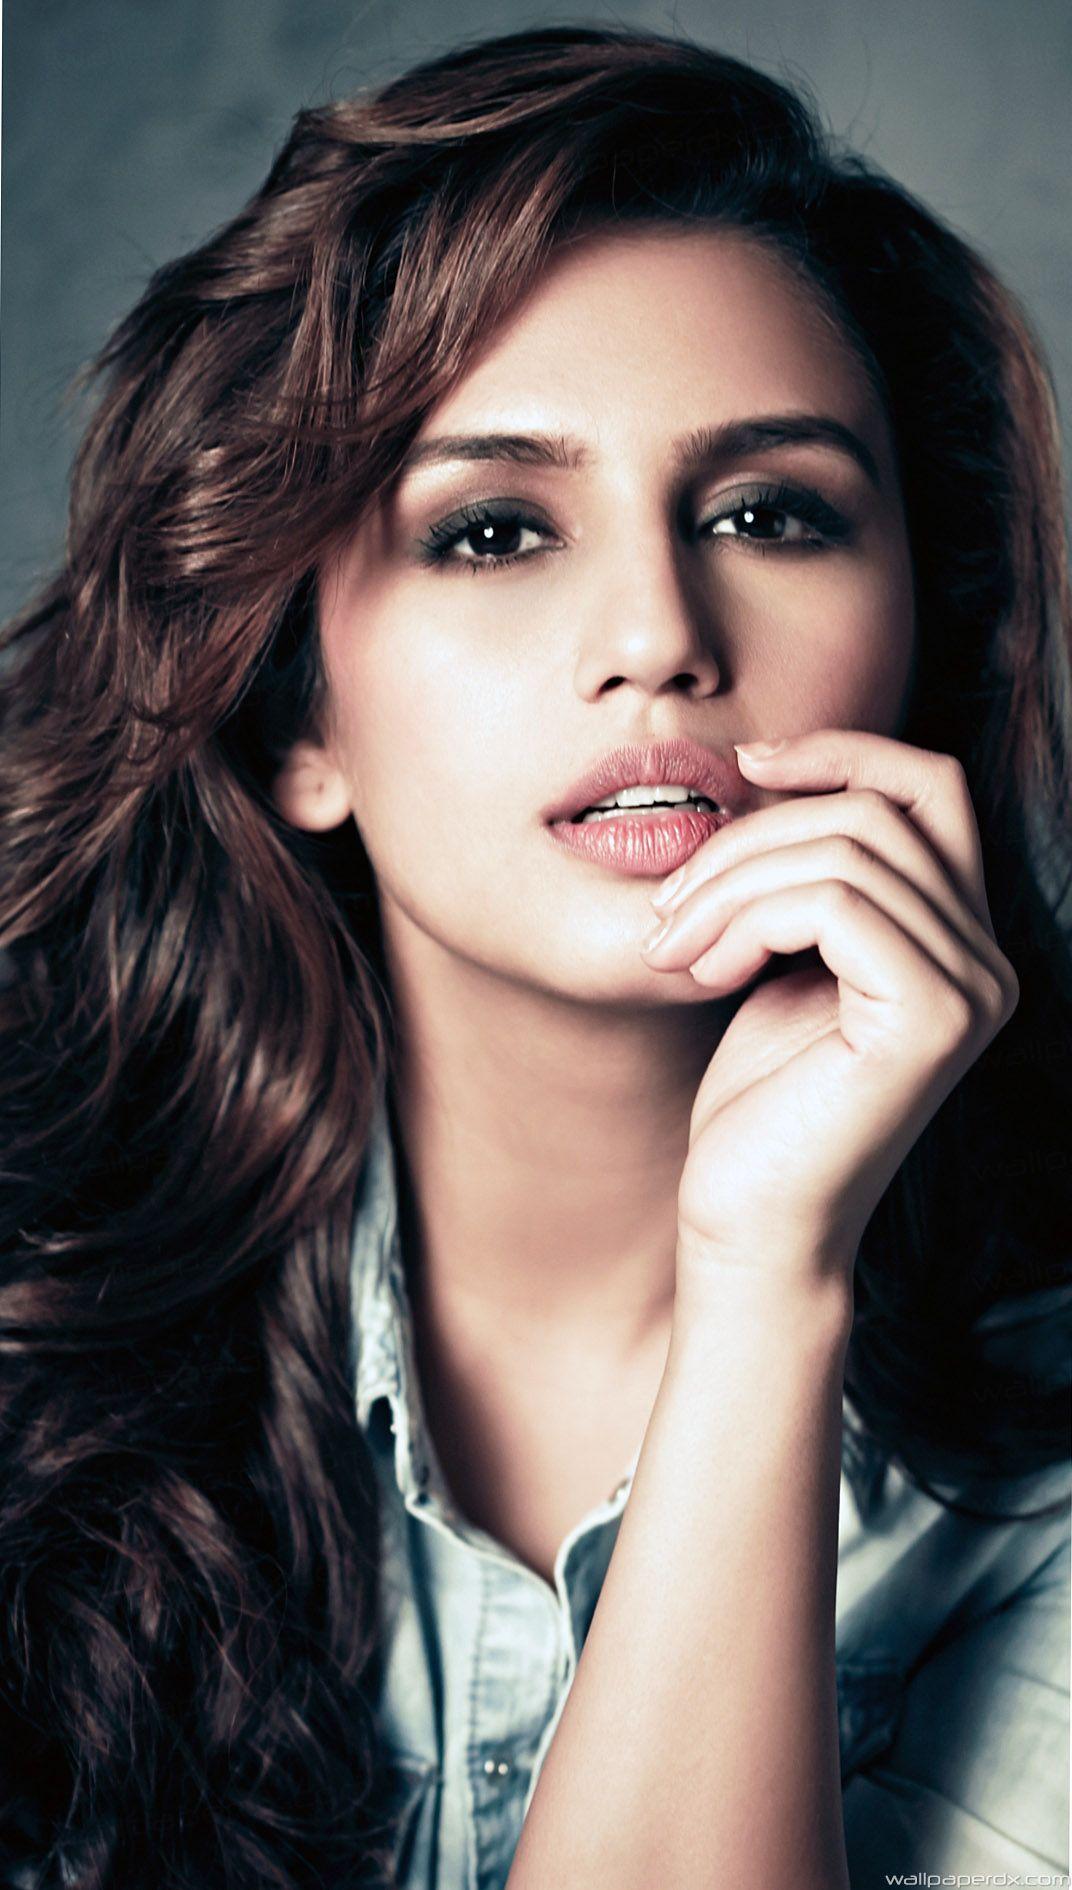 Bollywood Muslim Actress 1072x1890 Download Hd Wallpaper Wallpapertip